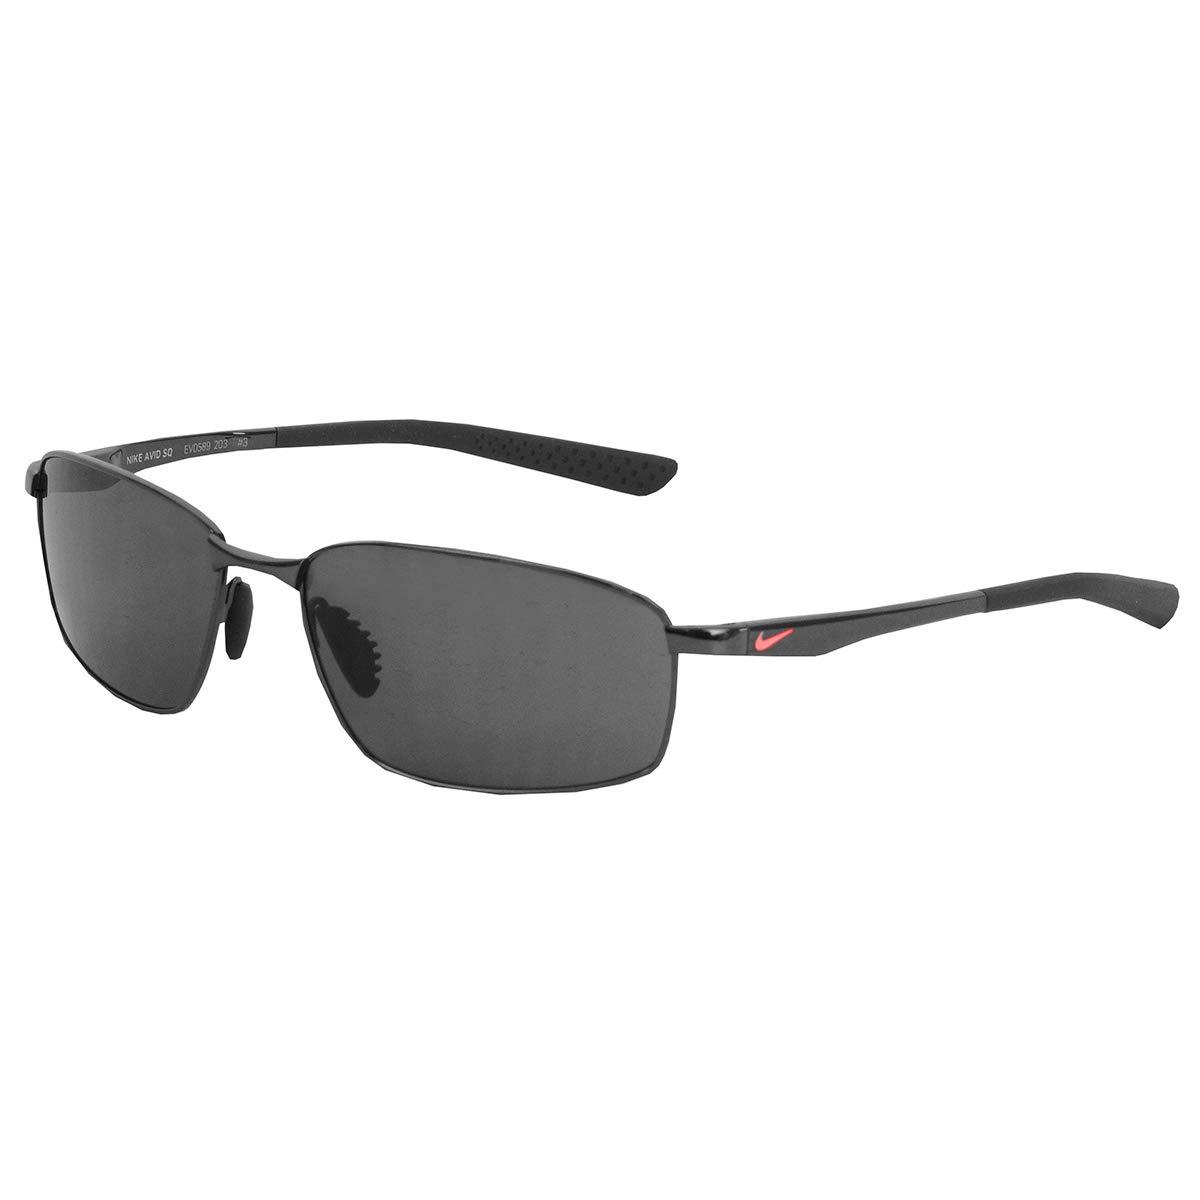 Nike Avid SQ Sunglasses (Black Frame, Grey Lens)